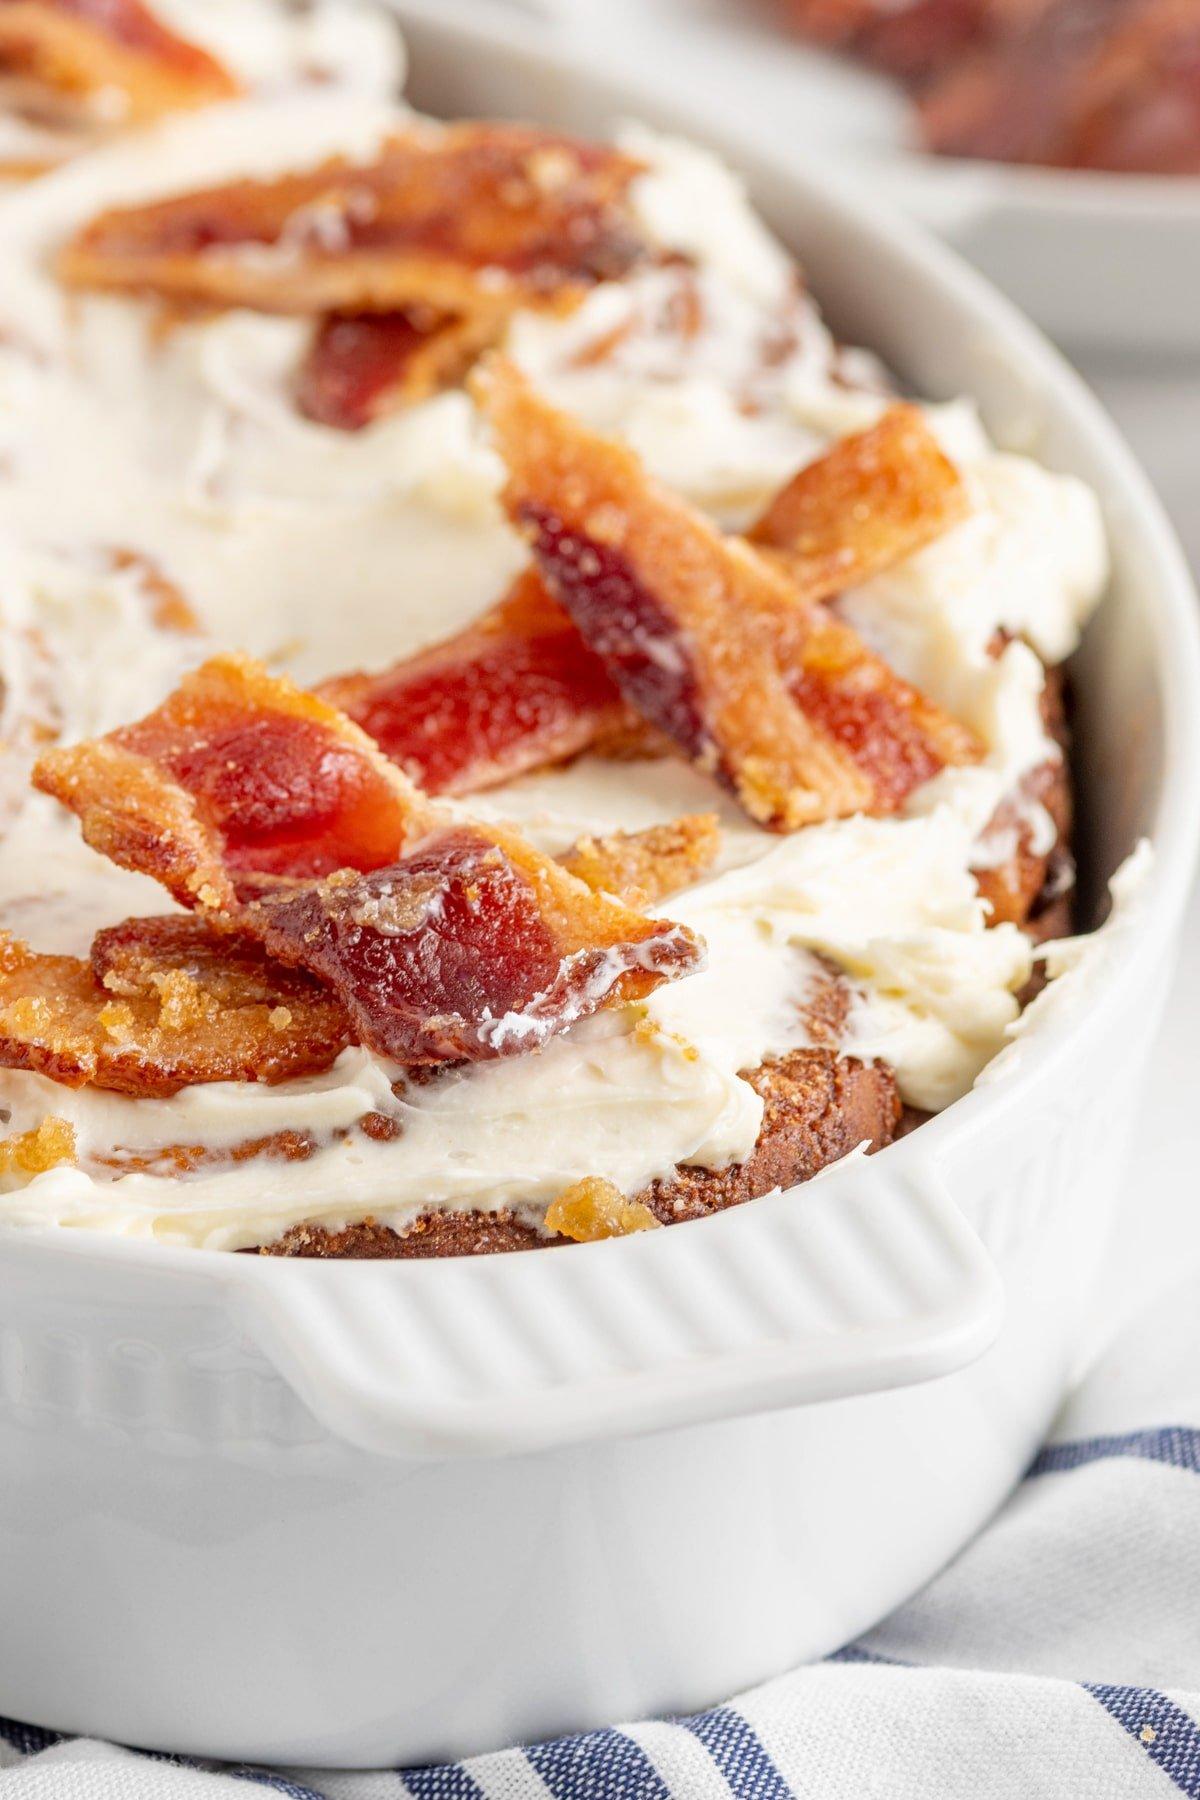 Bacon cinnamon rolls in a white baking dish